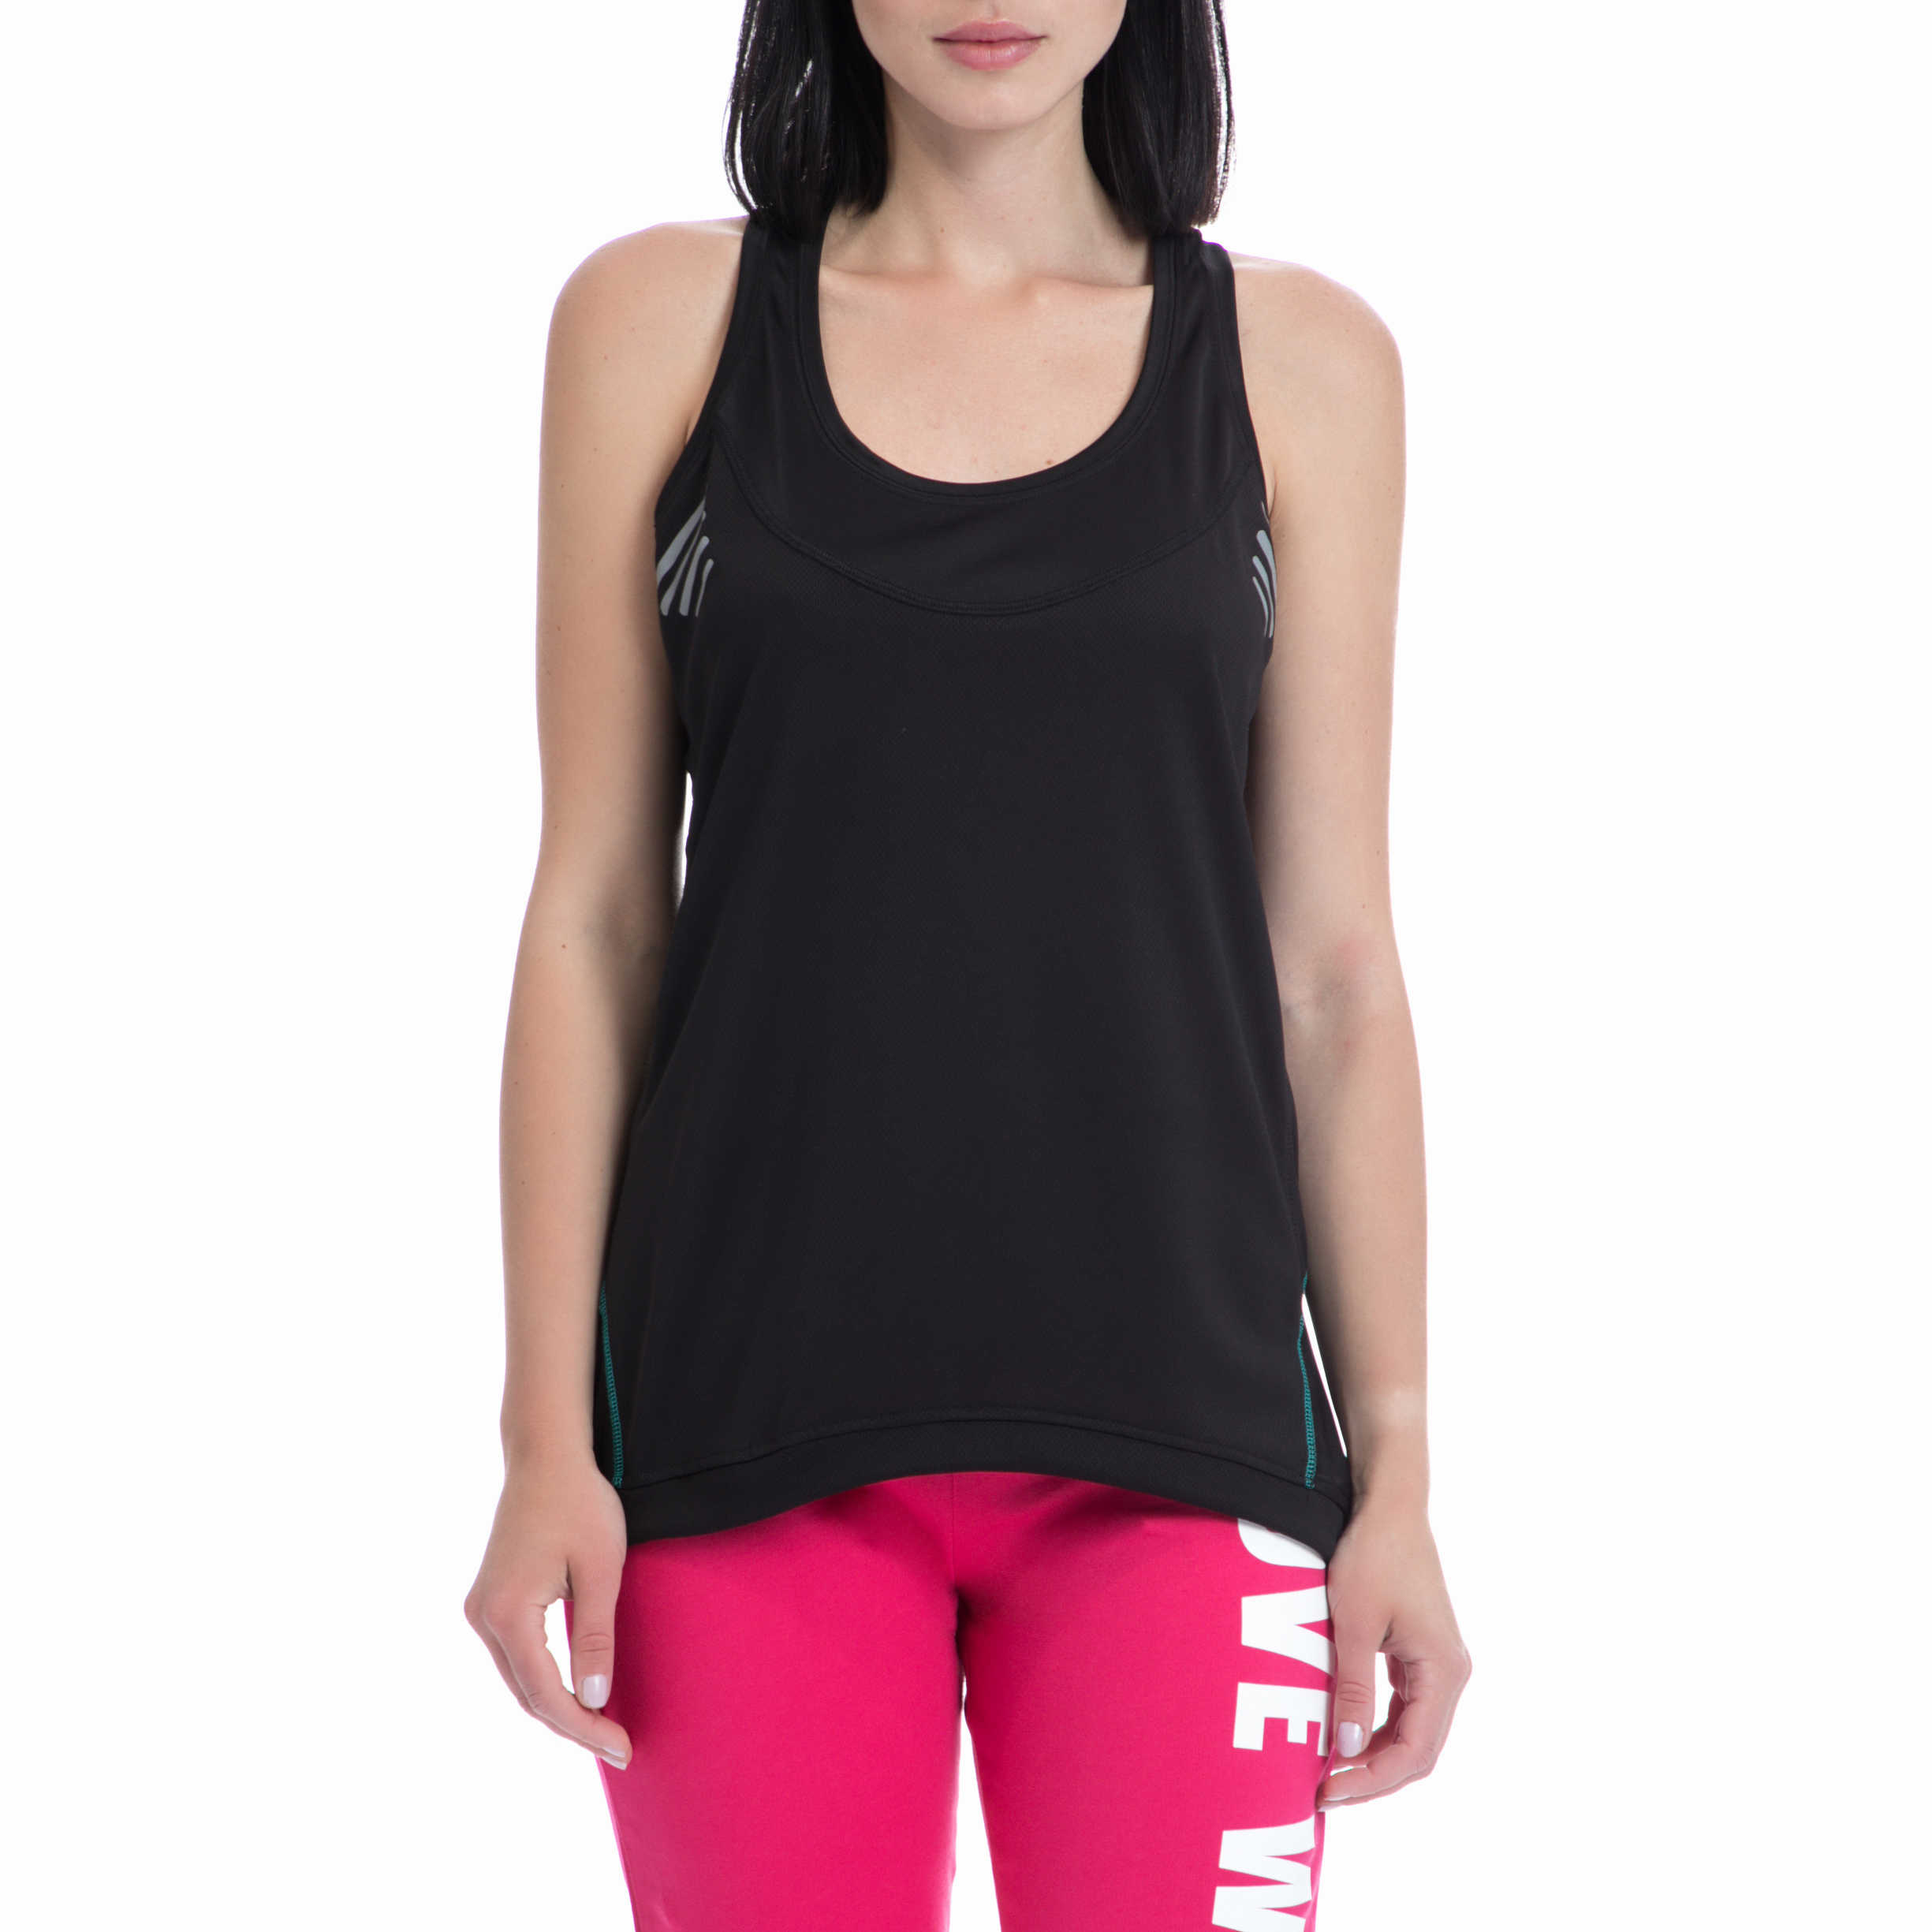 482727449a4b BODYTALK - Γυναικεία αμάνικη μπλούζα BODYTALK μαύρη